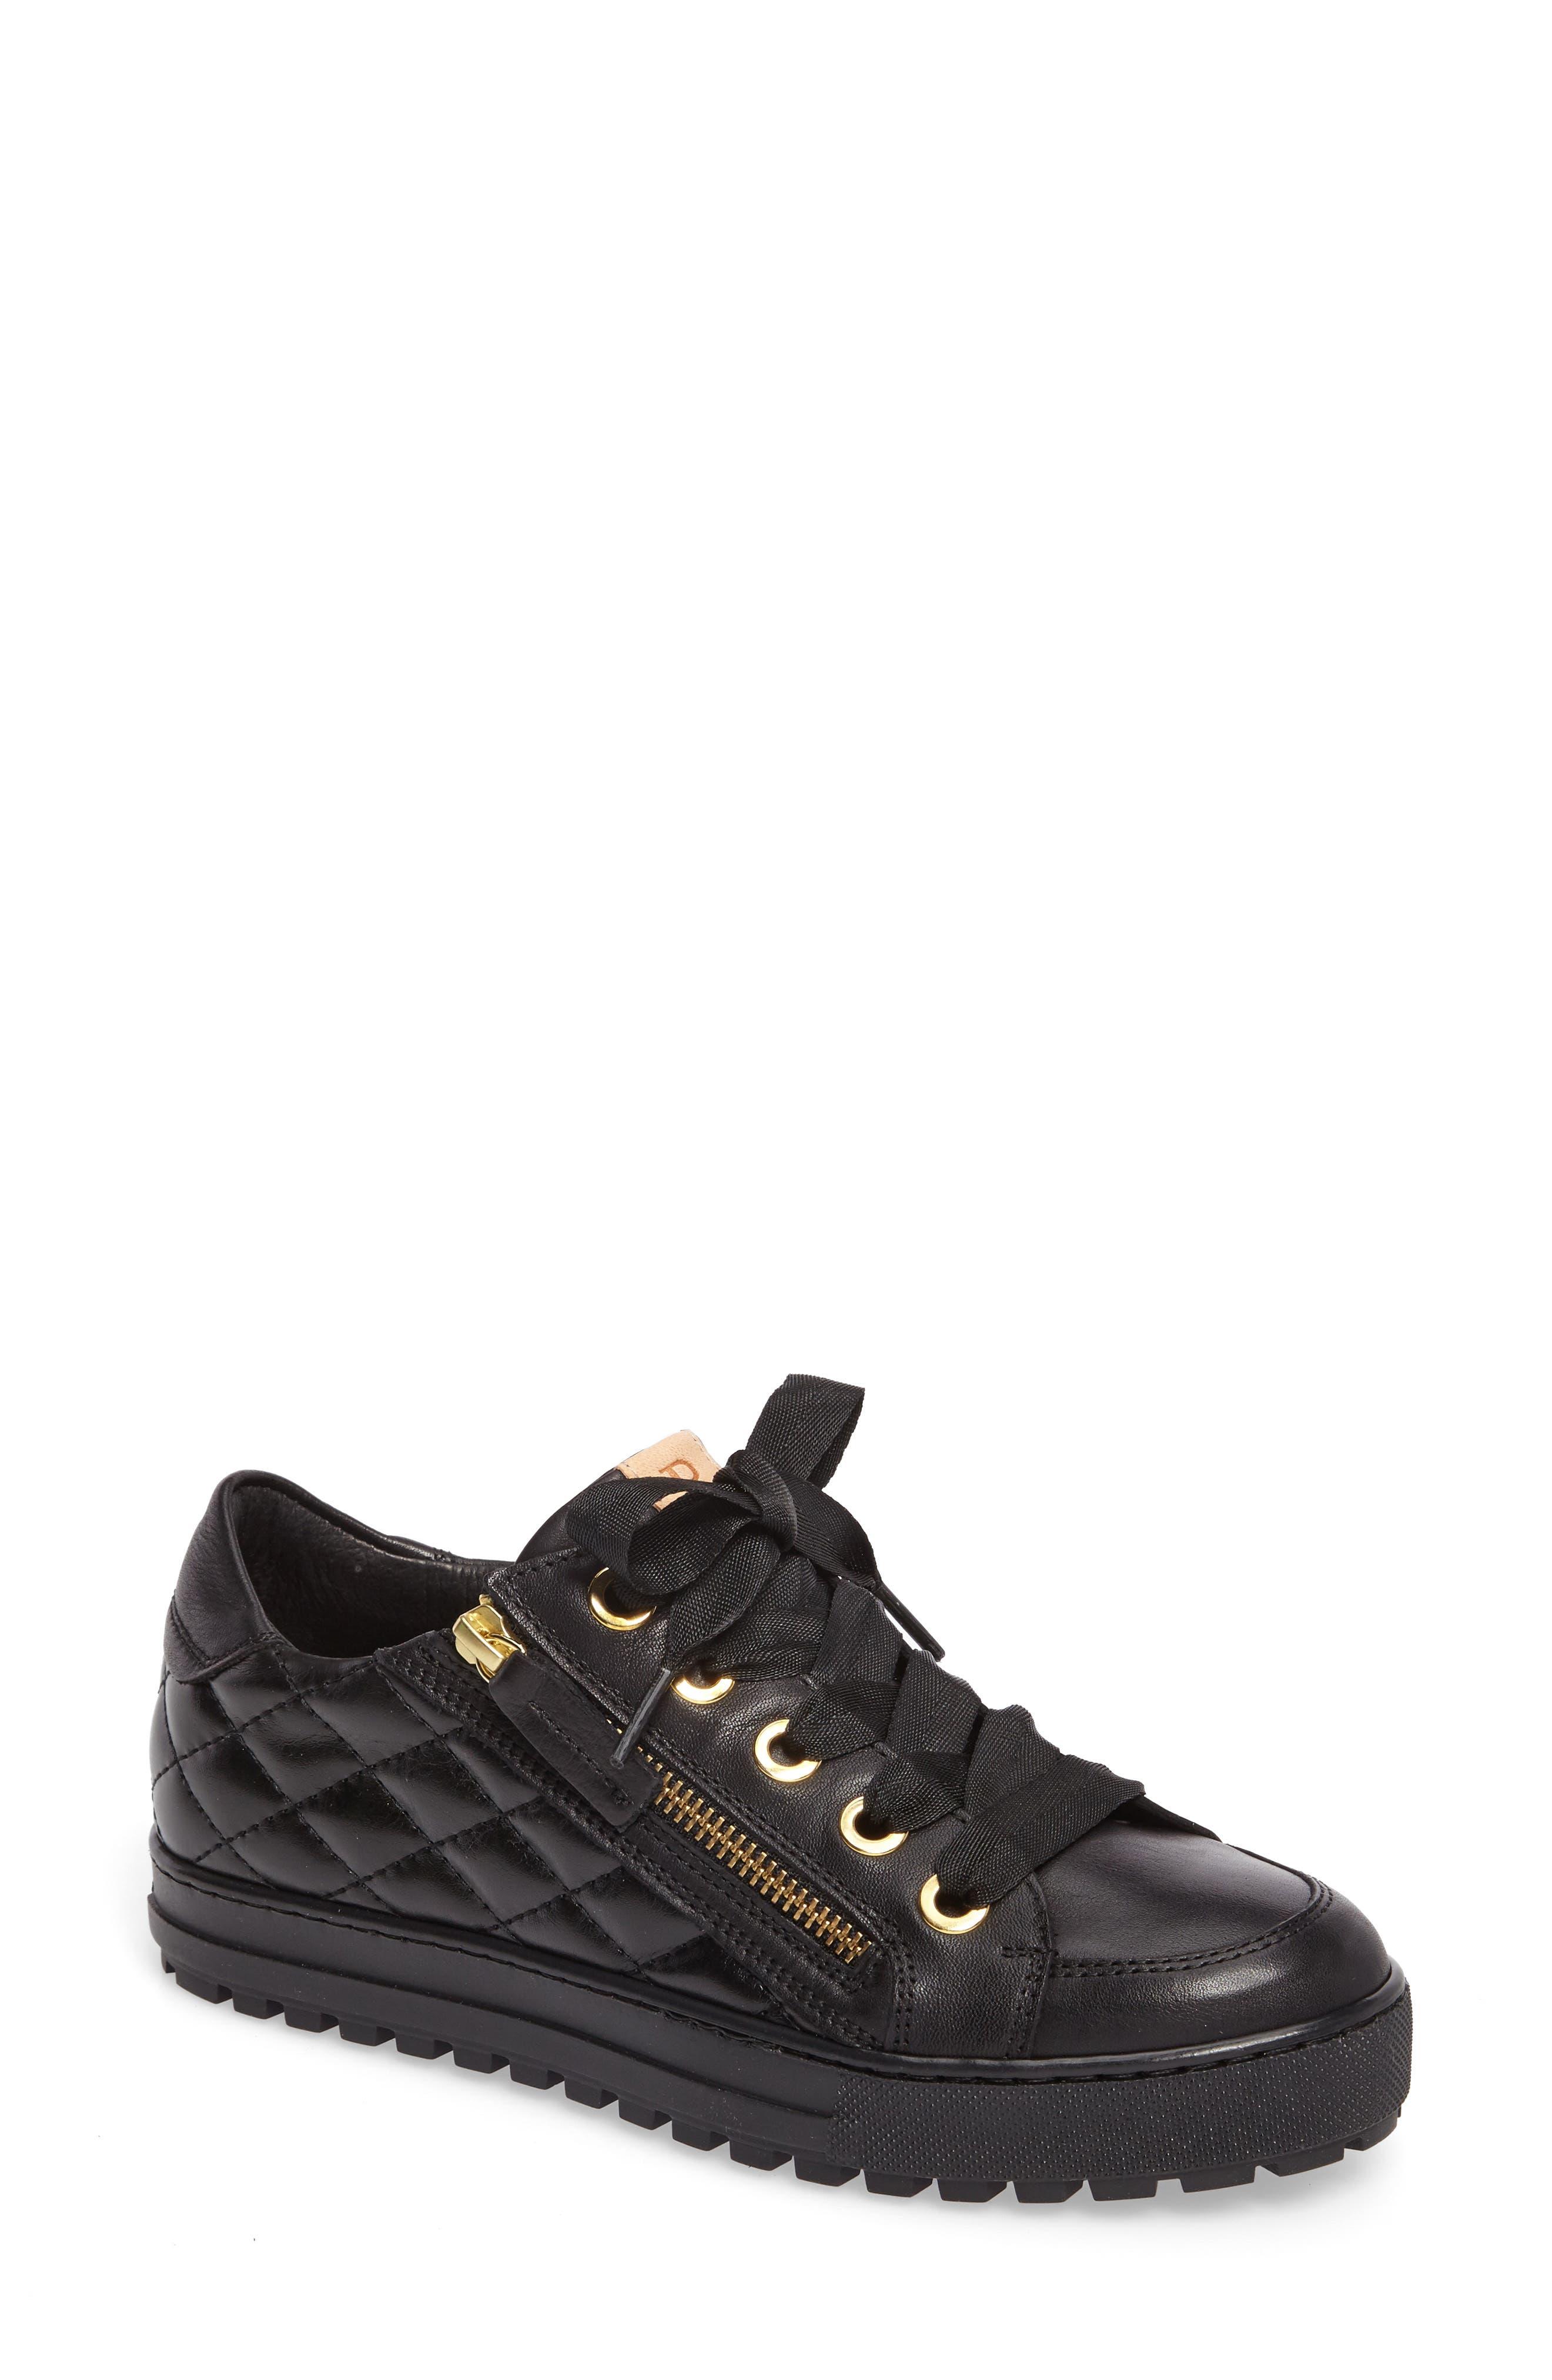 Linden Sneaker,                             Main thumbnail 1, color,                             001